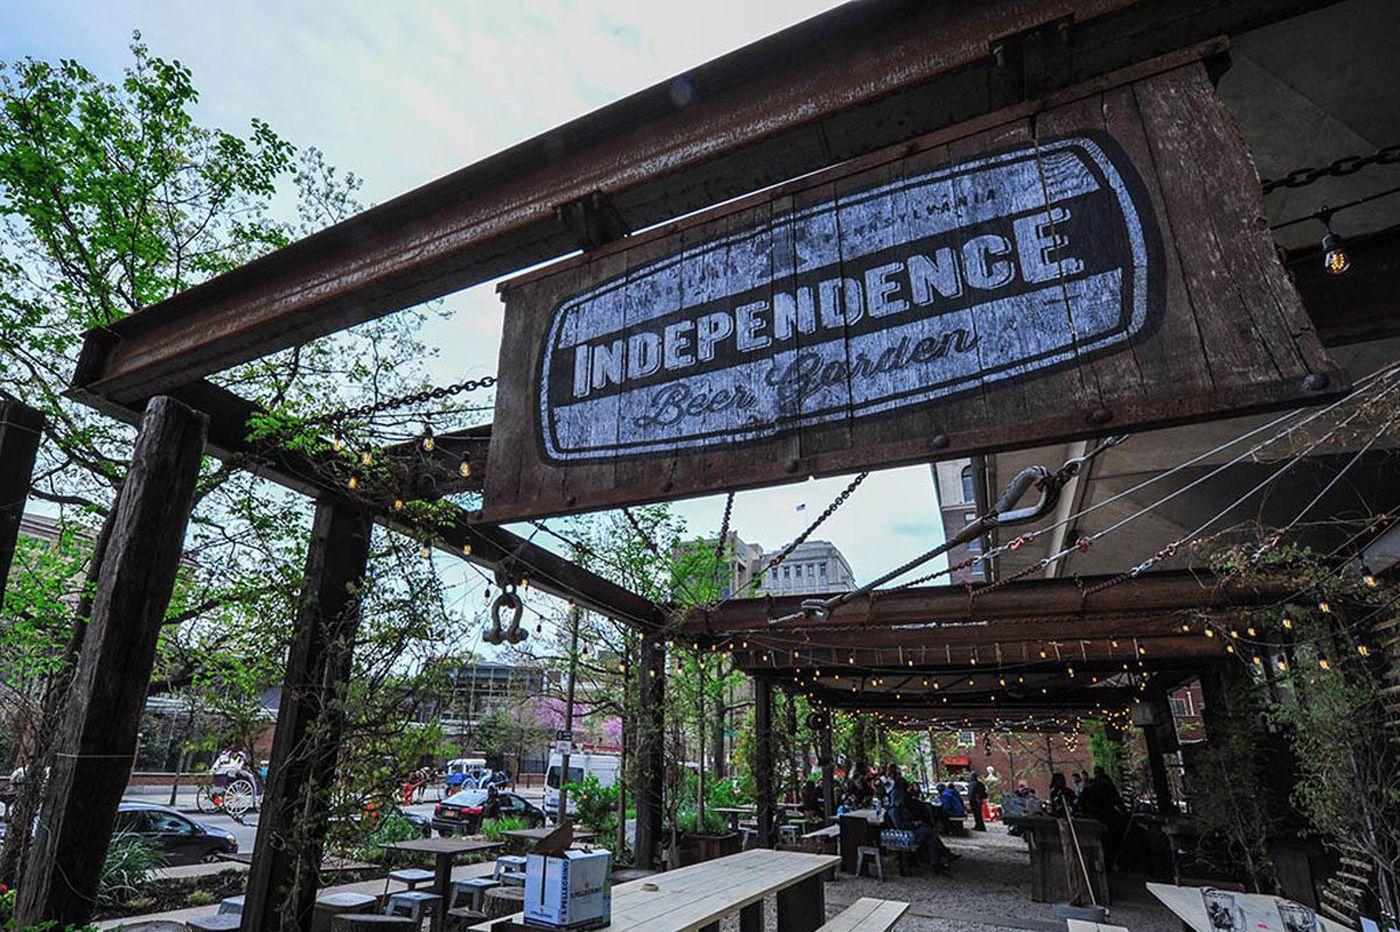 A guide to outdoor restaurants and beer gardens in Philadelphia